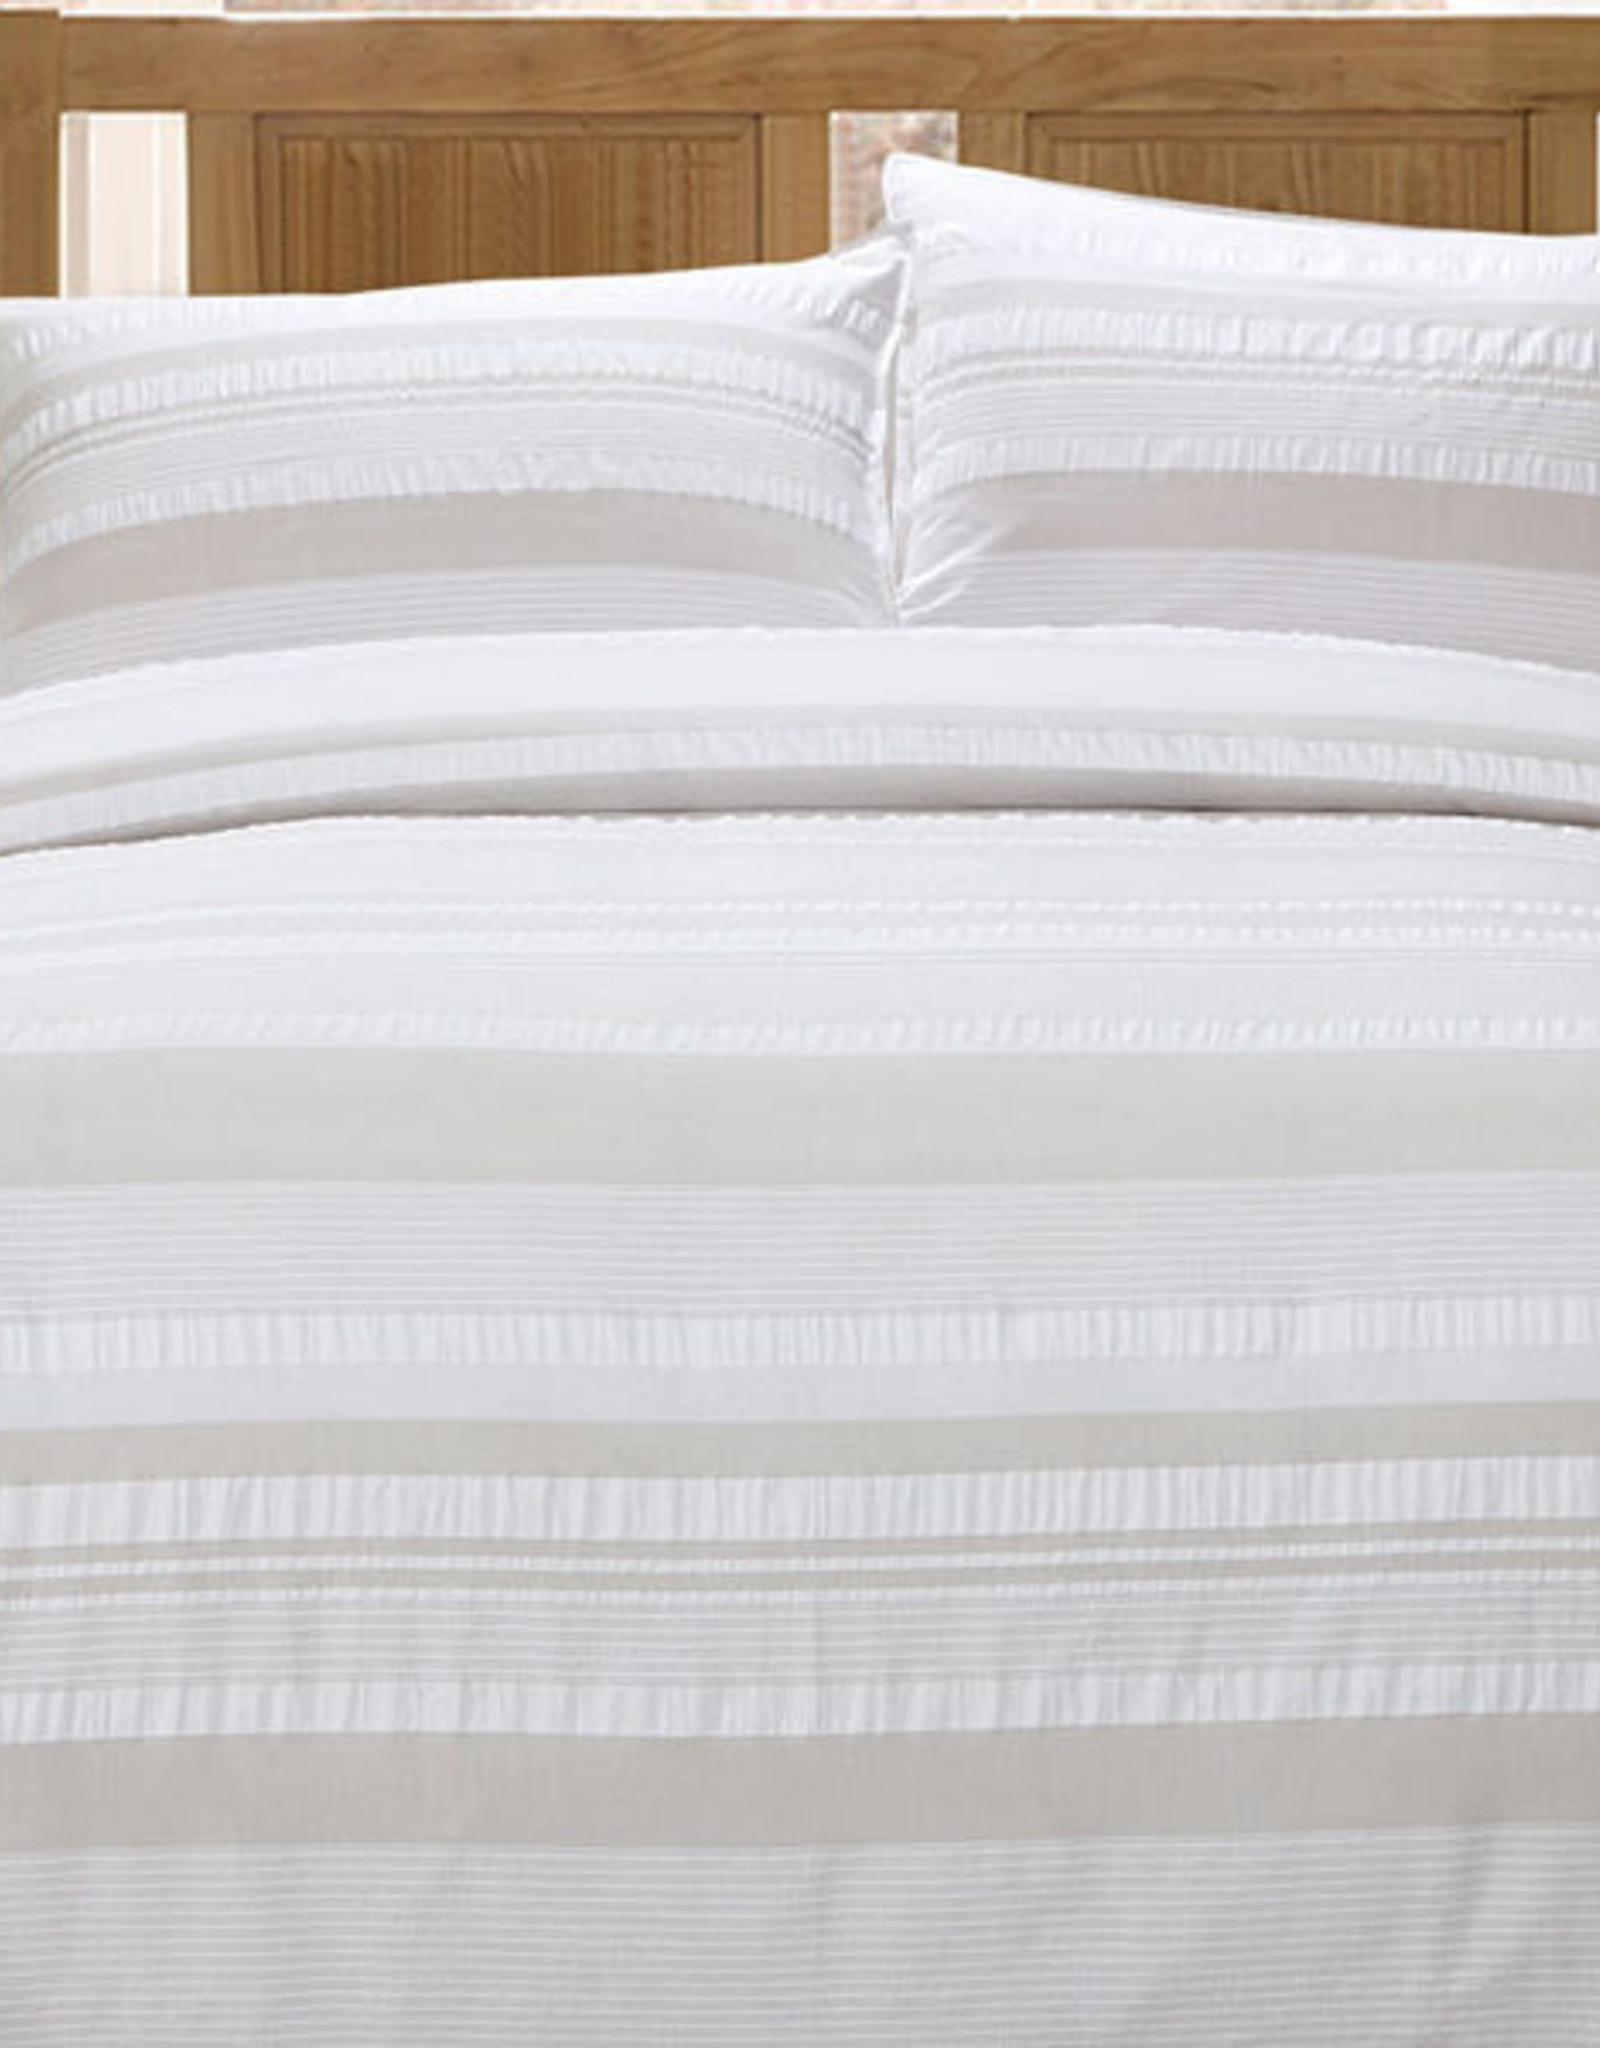 Daniadown Duvet Set Daniadown Palm Springs Queen w / Pillow Cases